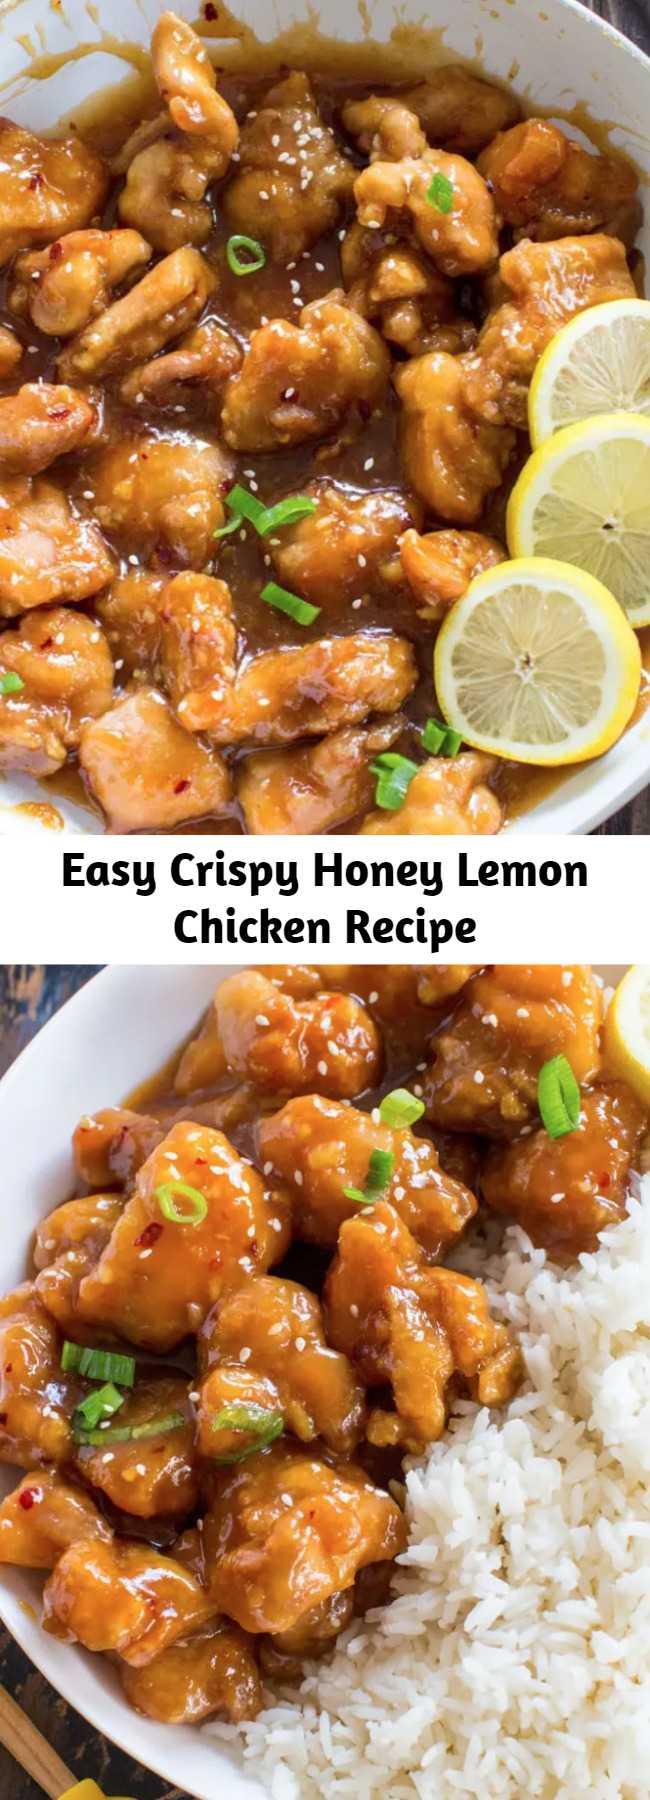 Easy Crispy Honey Lemon Chicken Recipe - Crispy Honey Lemon Chicken is a restaurant-worthy meal, that can be made at home in just 30 minutes! Crispy, sticky and full of honey lemon flavor.